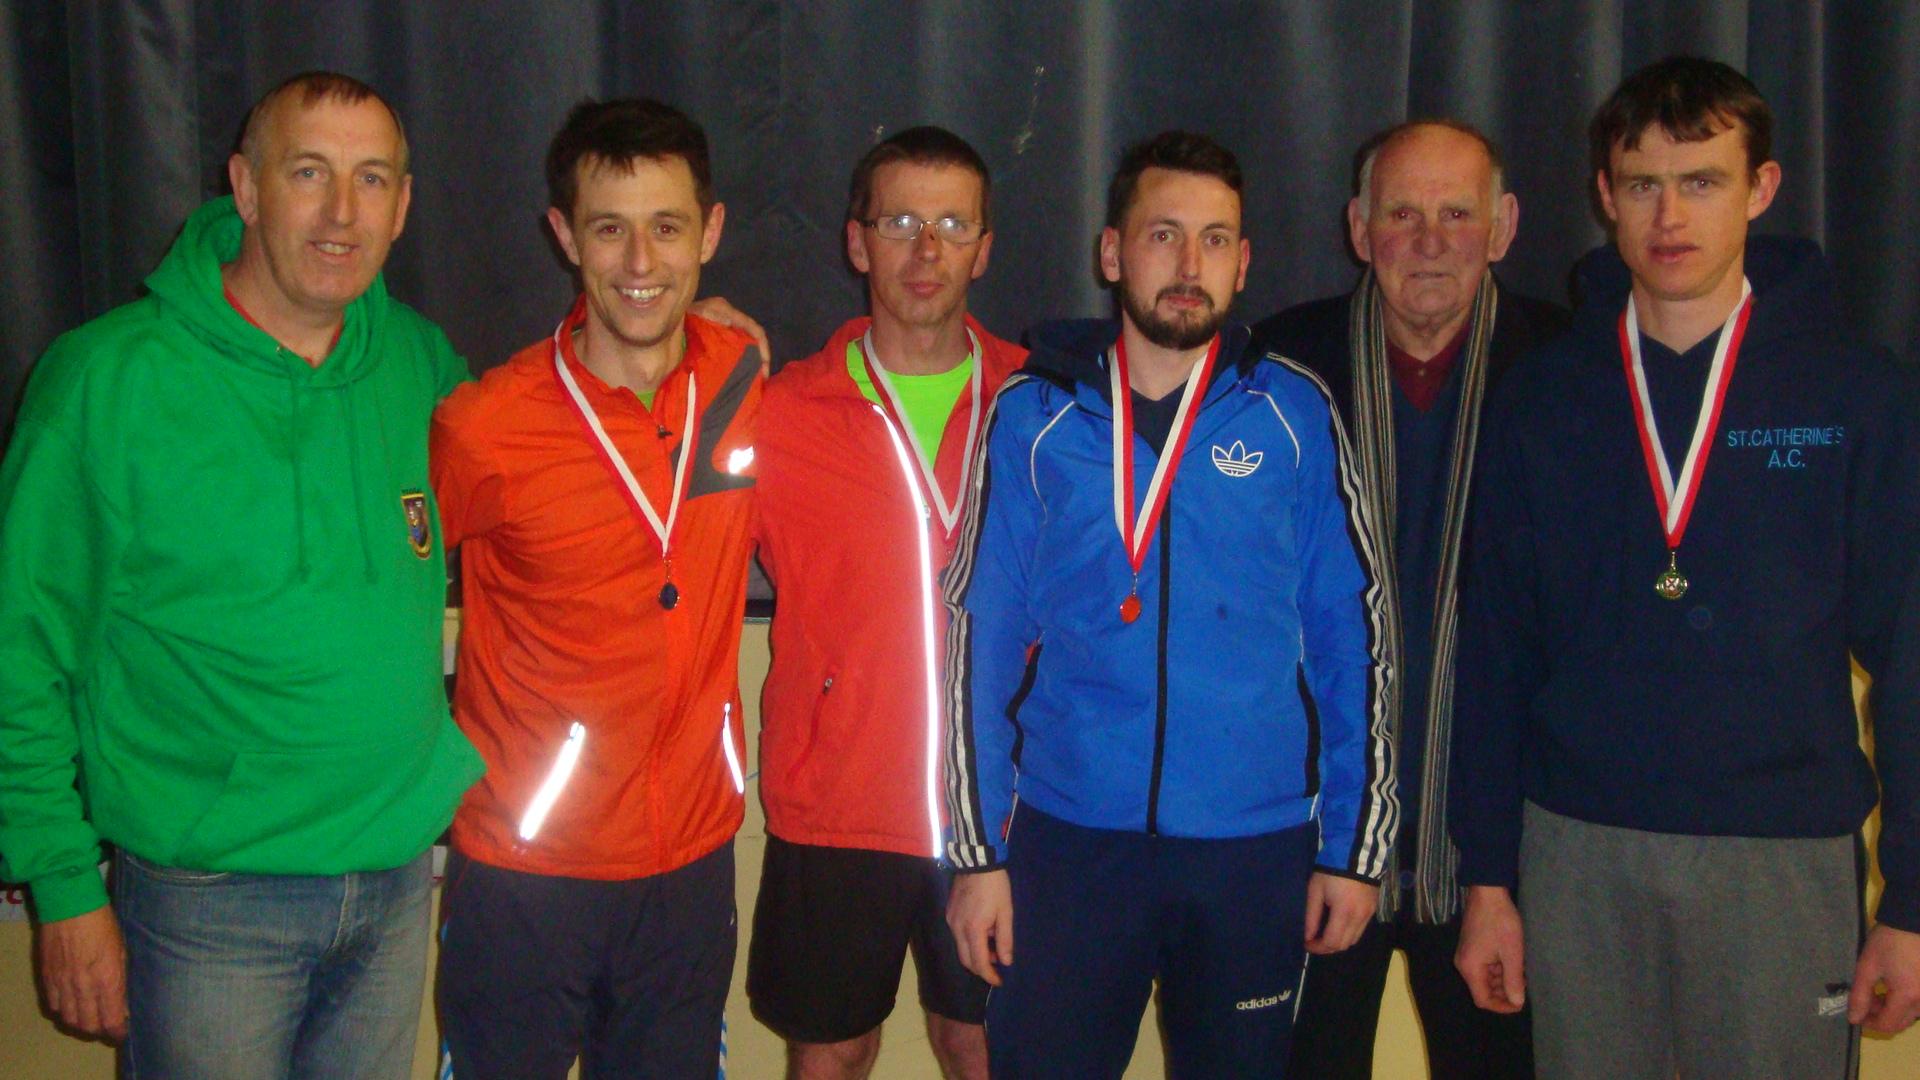 Martin Drake, Mike Byrne, Kevin Hayes, Alan Carr, Dan McCarthy and John Beecher. St. Catherine's winning Mens team at East Cork Road Race in Ballynoe